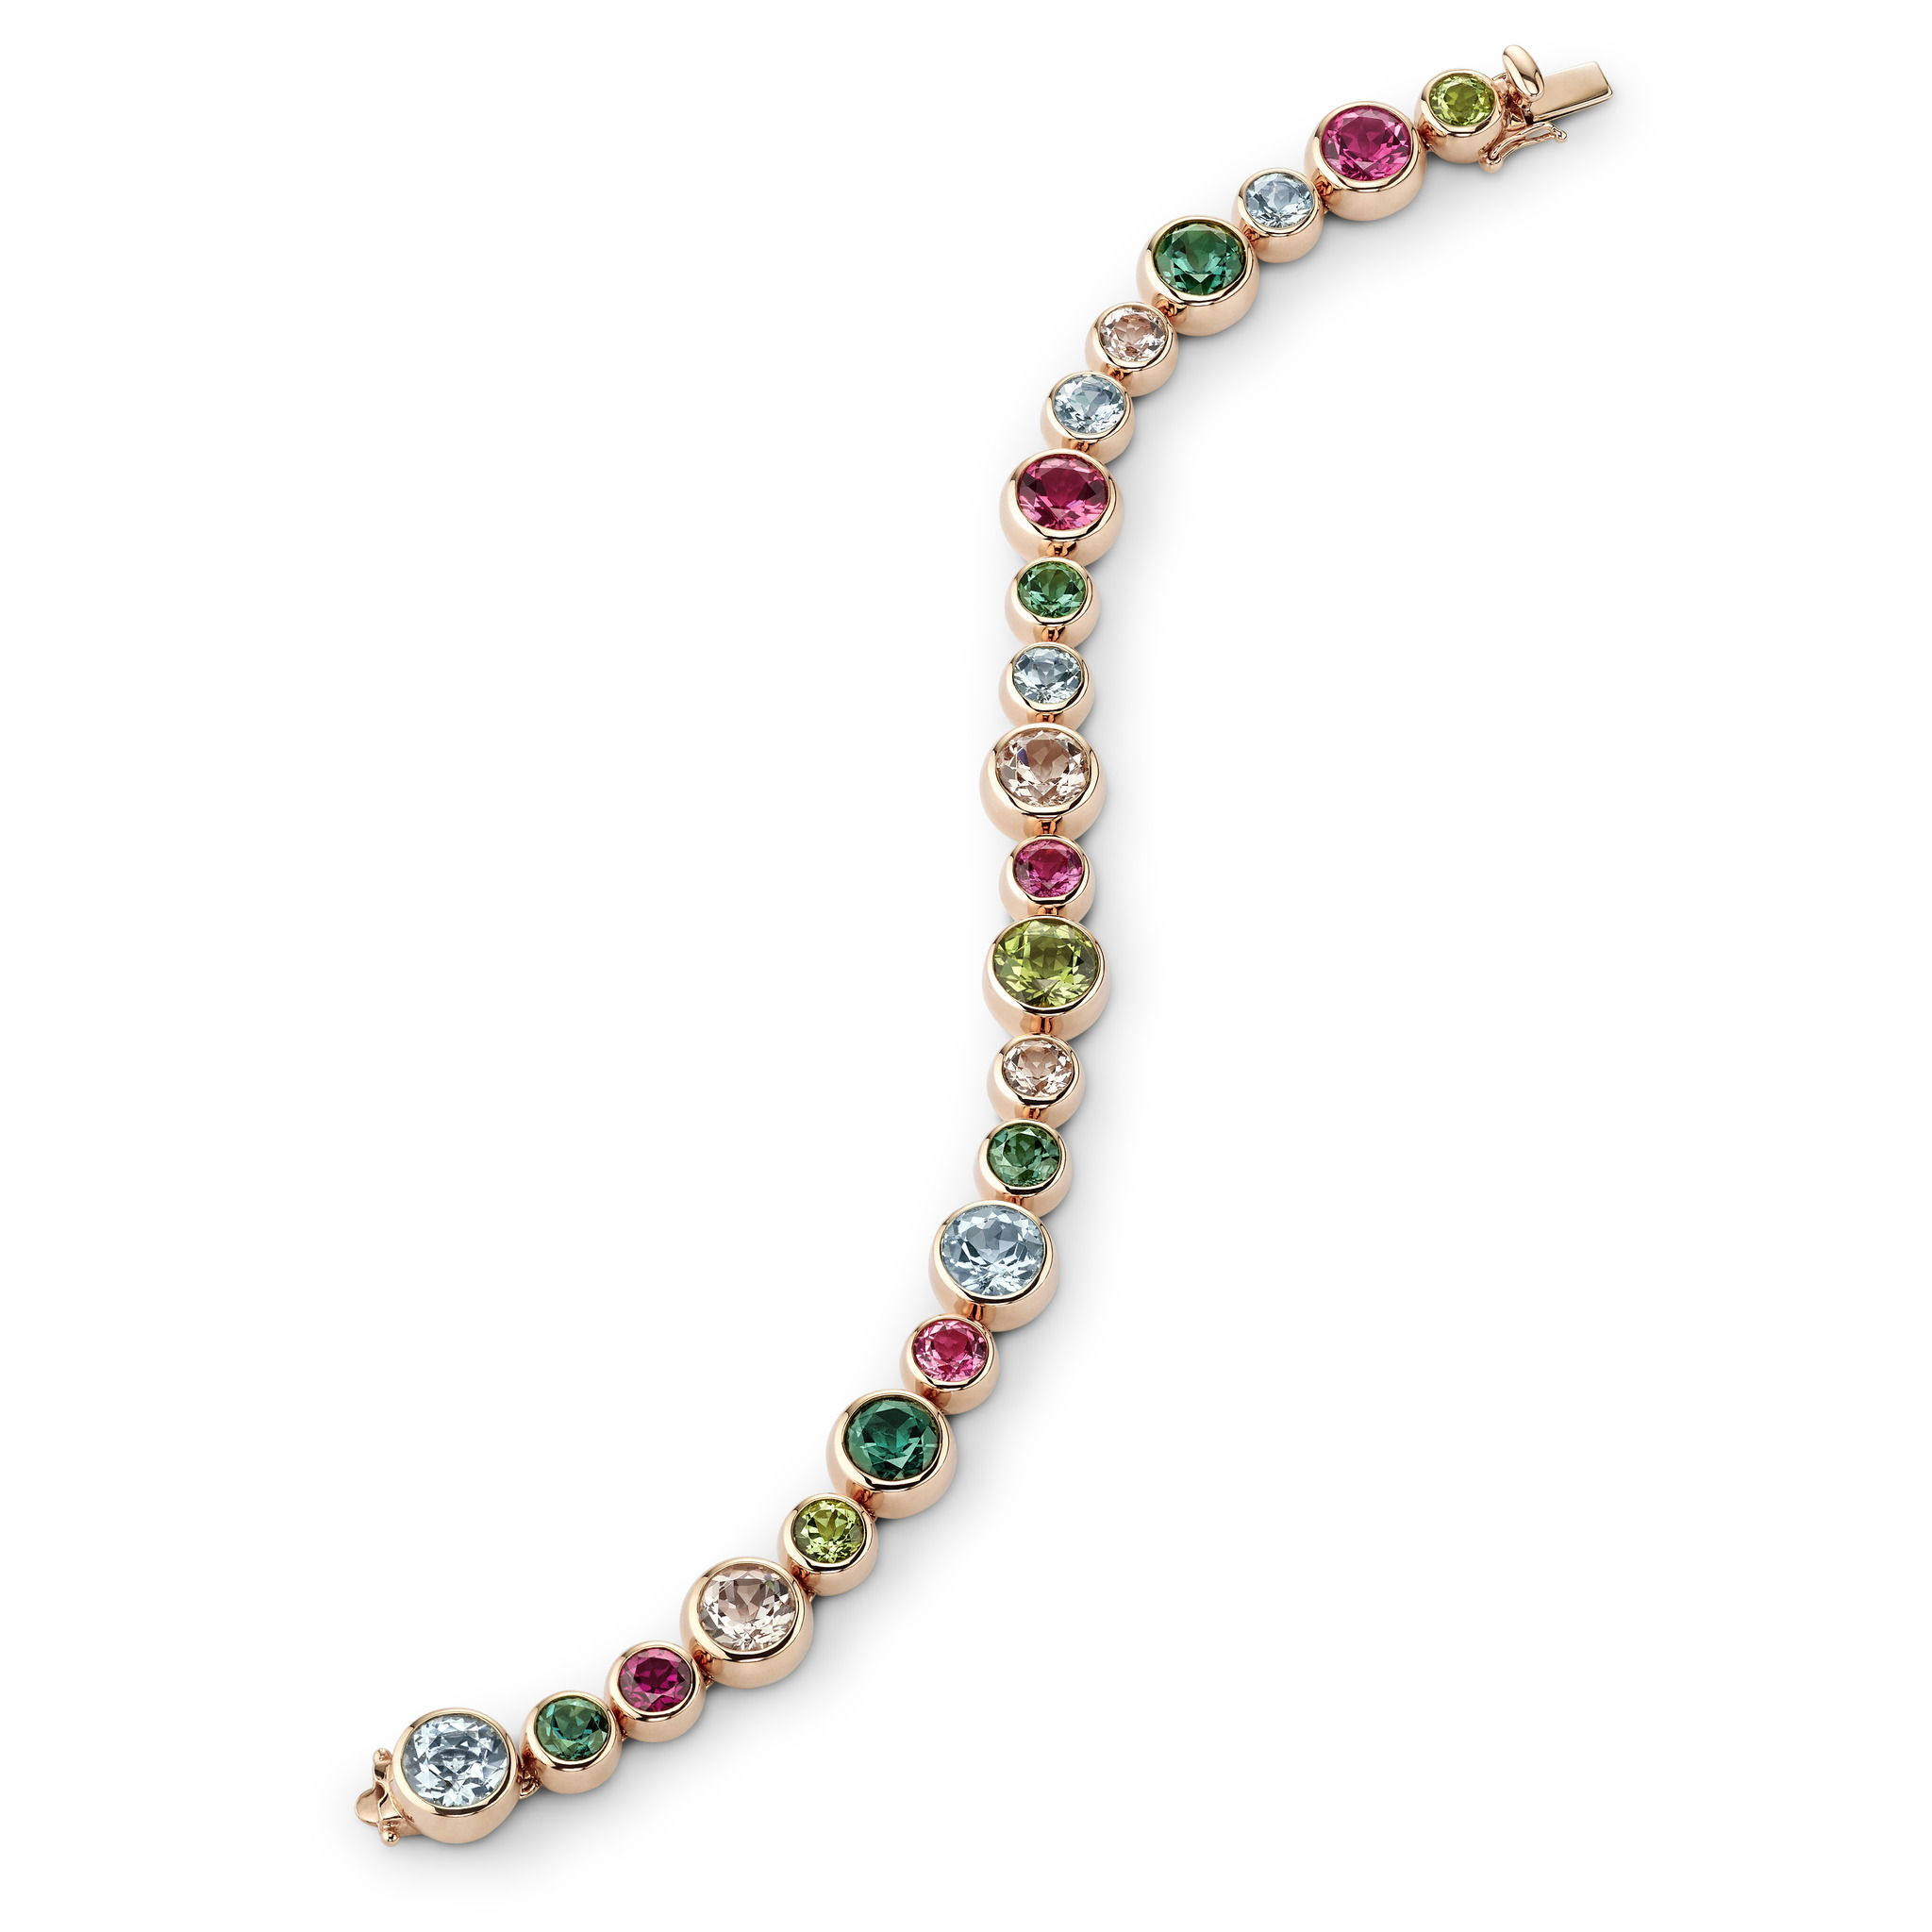 Bracelet with coloured gemstones